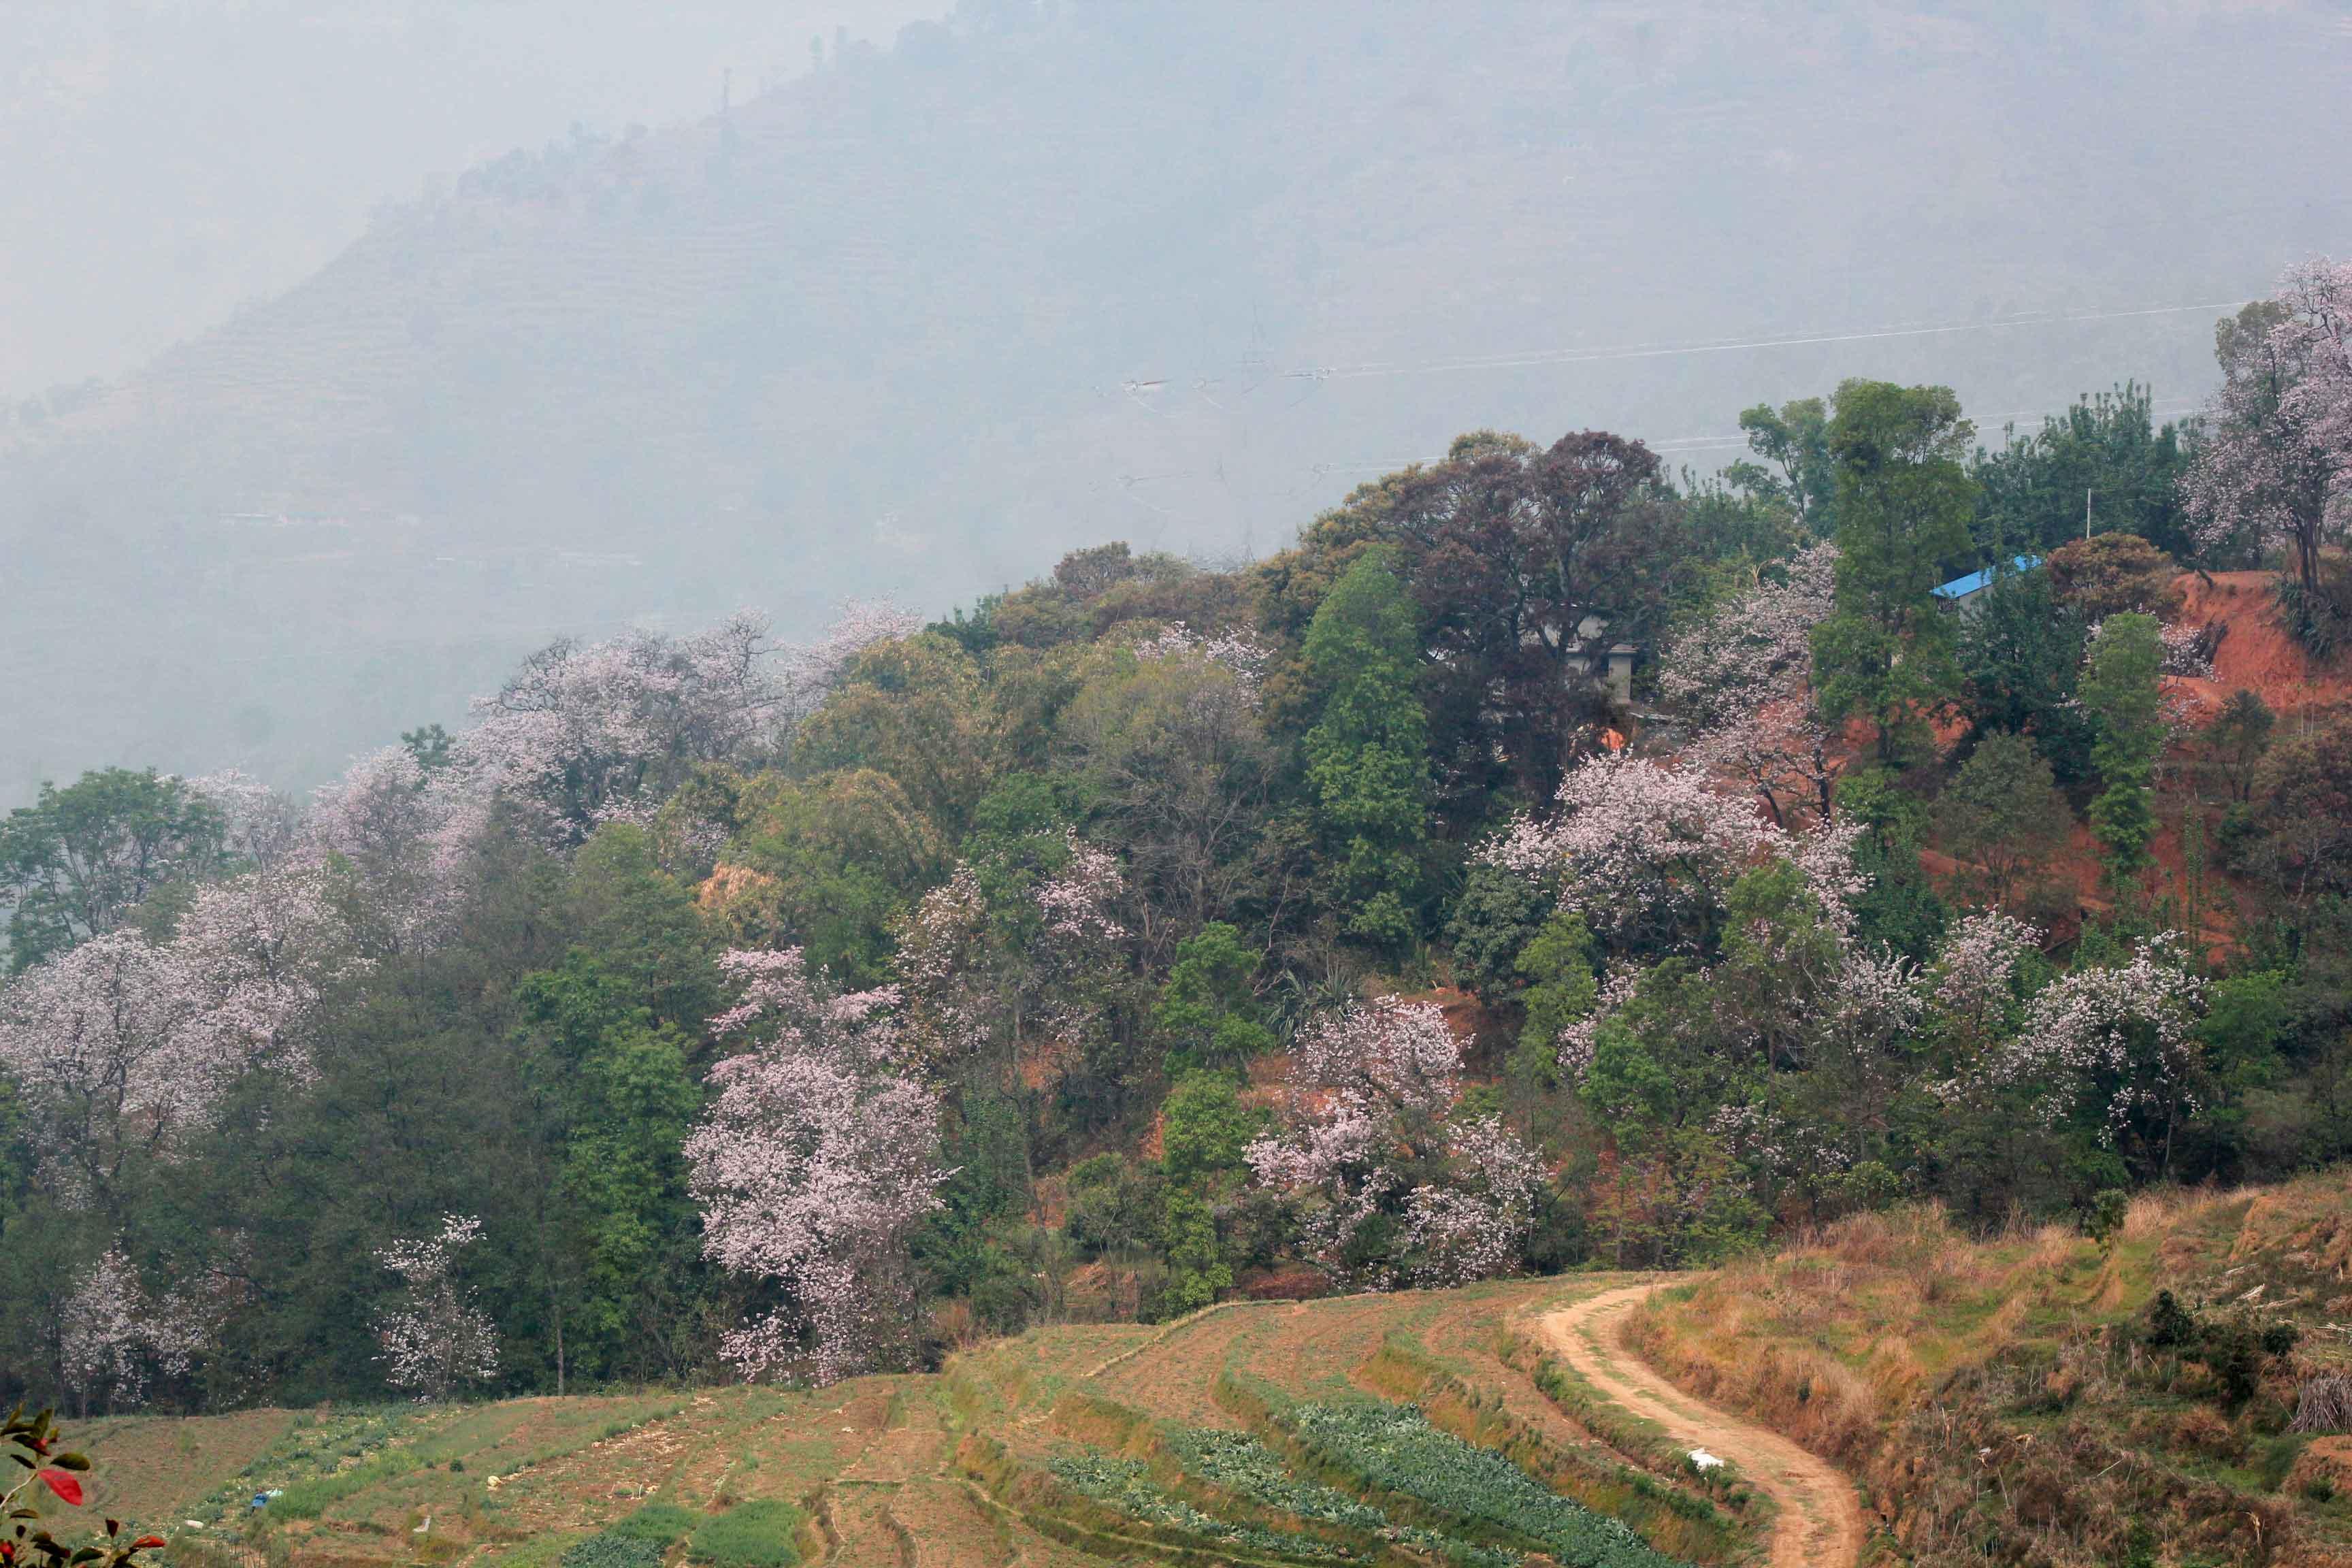 Bhimdhunga to Naubise in the Spring